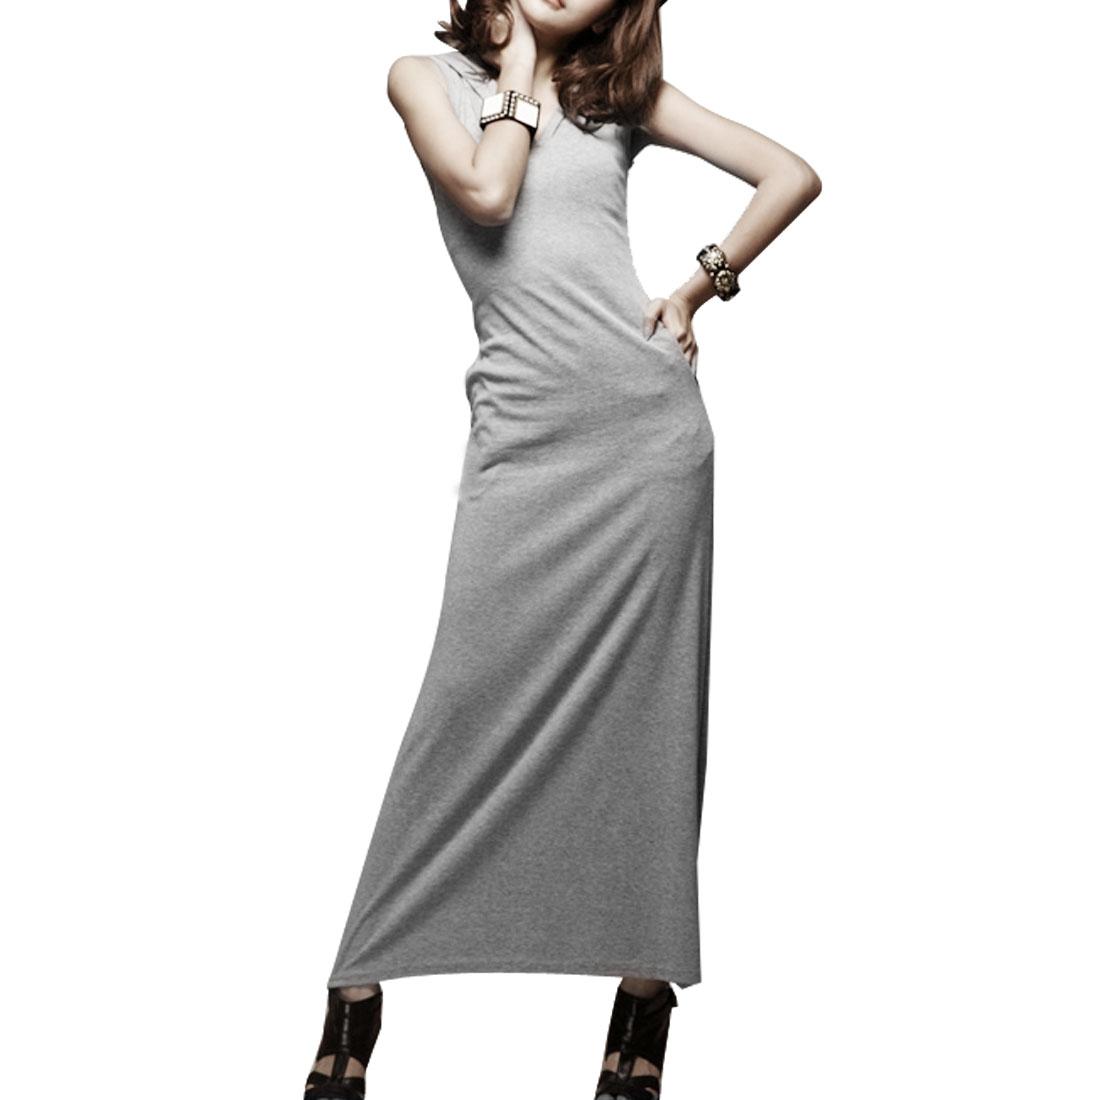 Woman Pure Gray Backless Summer Leisure Long Dress XS